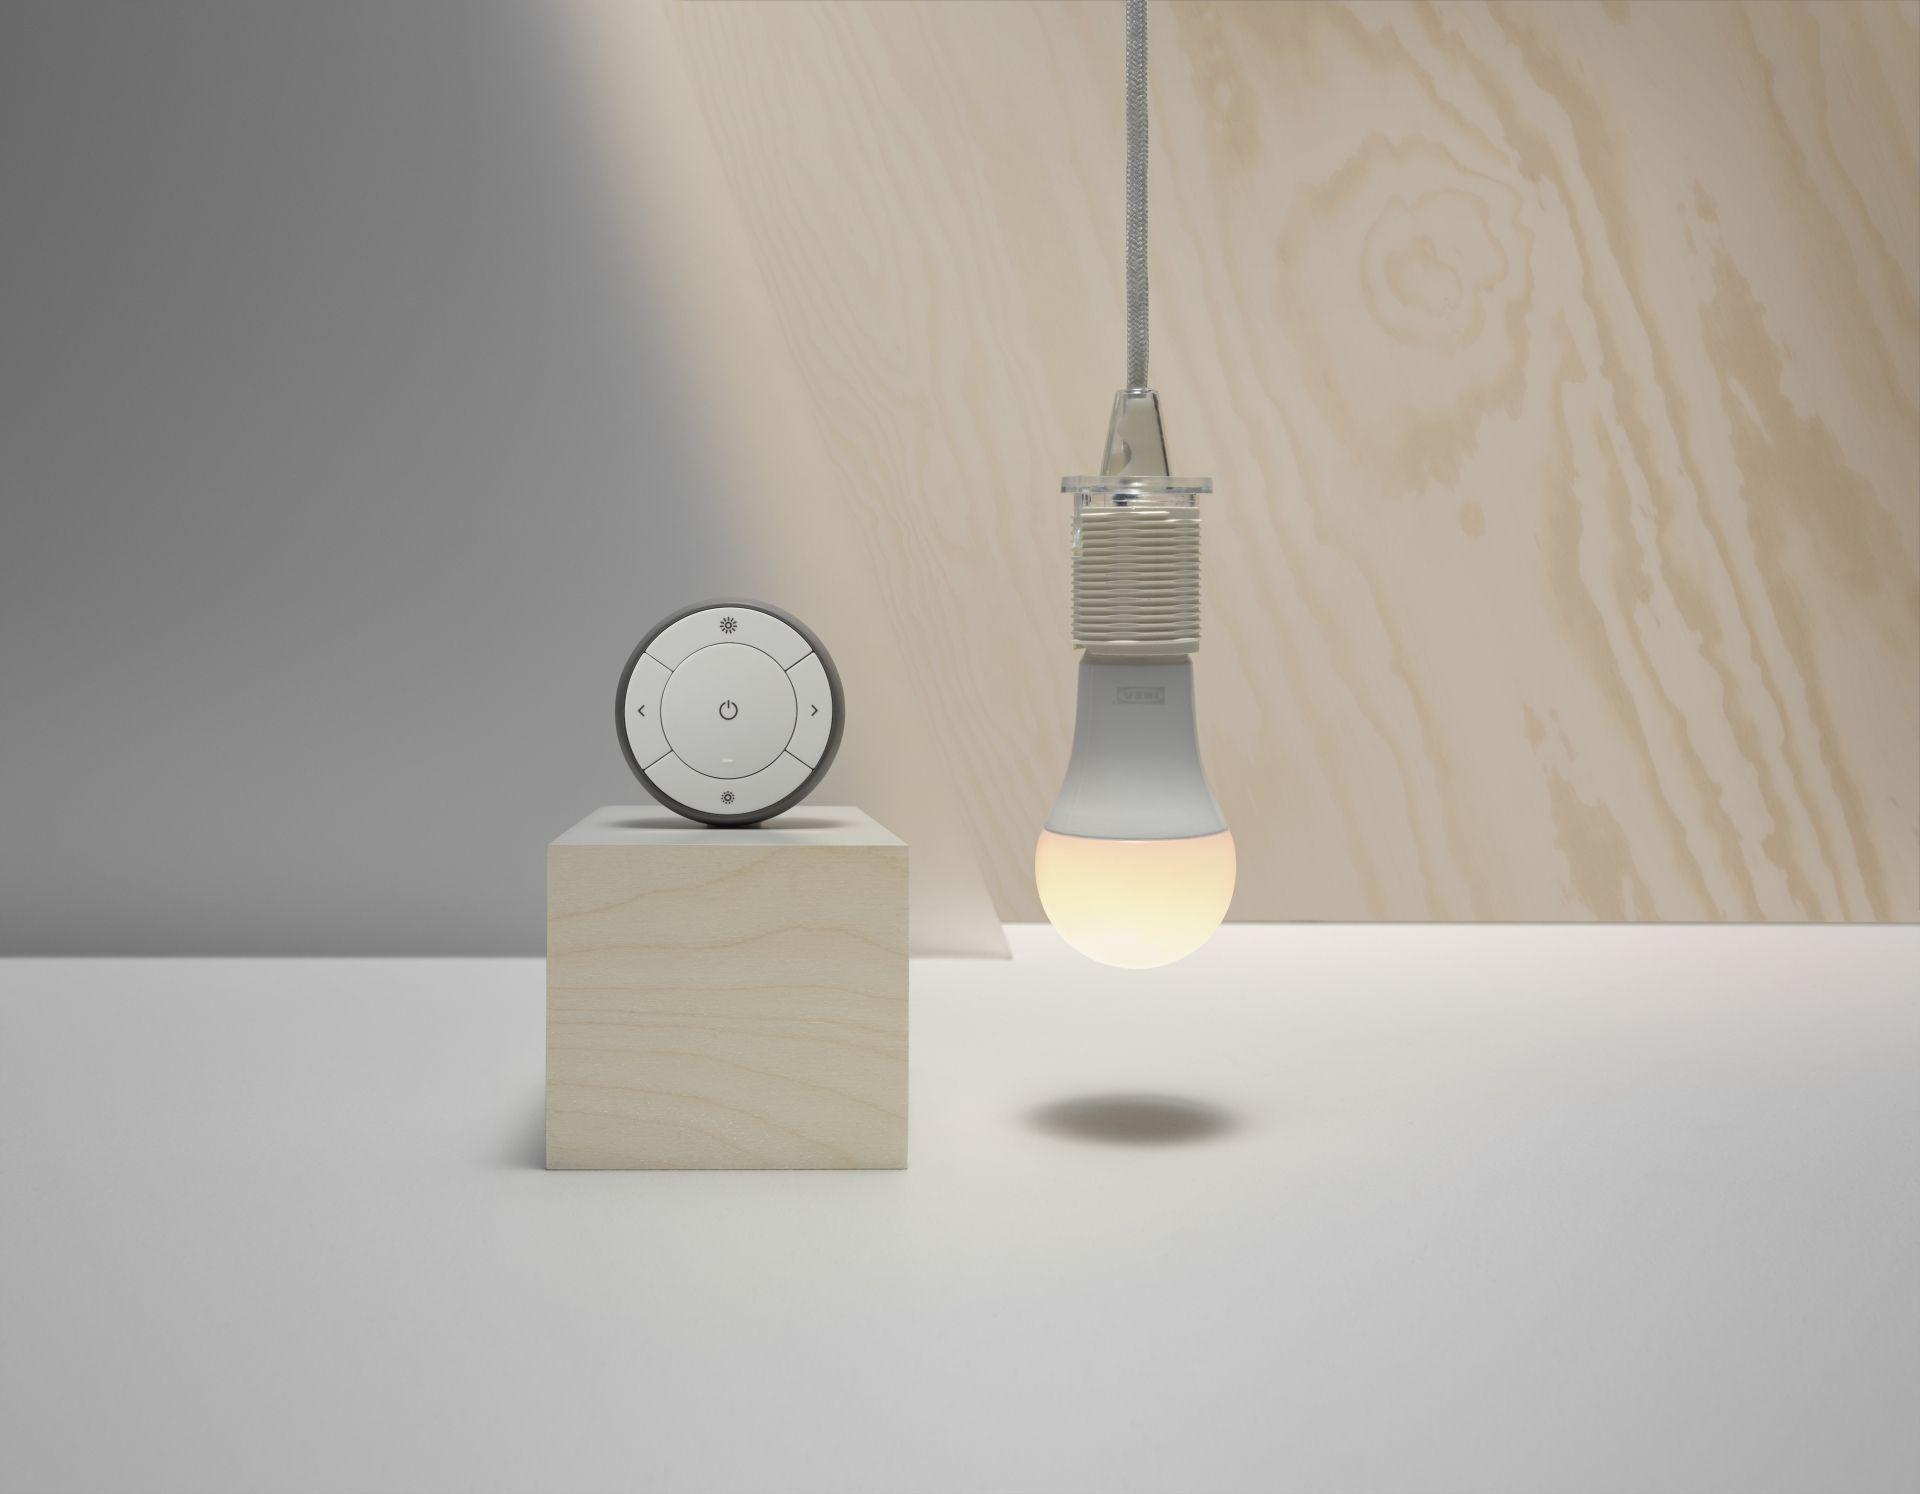 trdfri dimset ikea ikeanl ikeanederland slimme verlichting led led verlichting duurzaam duurzaamheid lamp lampen inspiratie wooninspiratie interieur